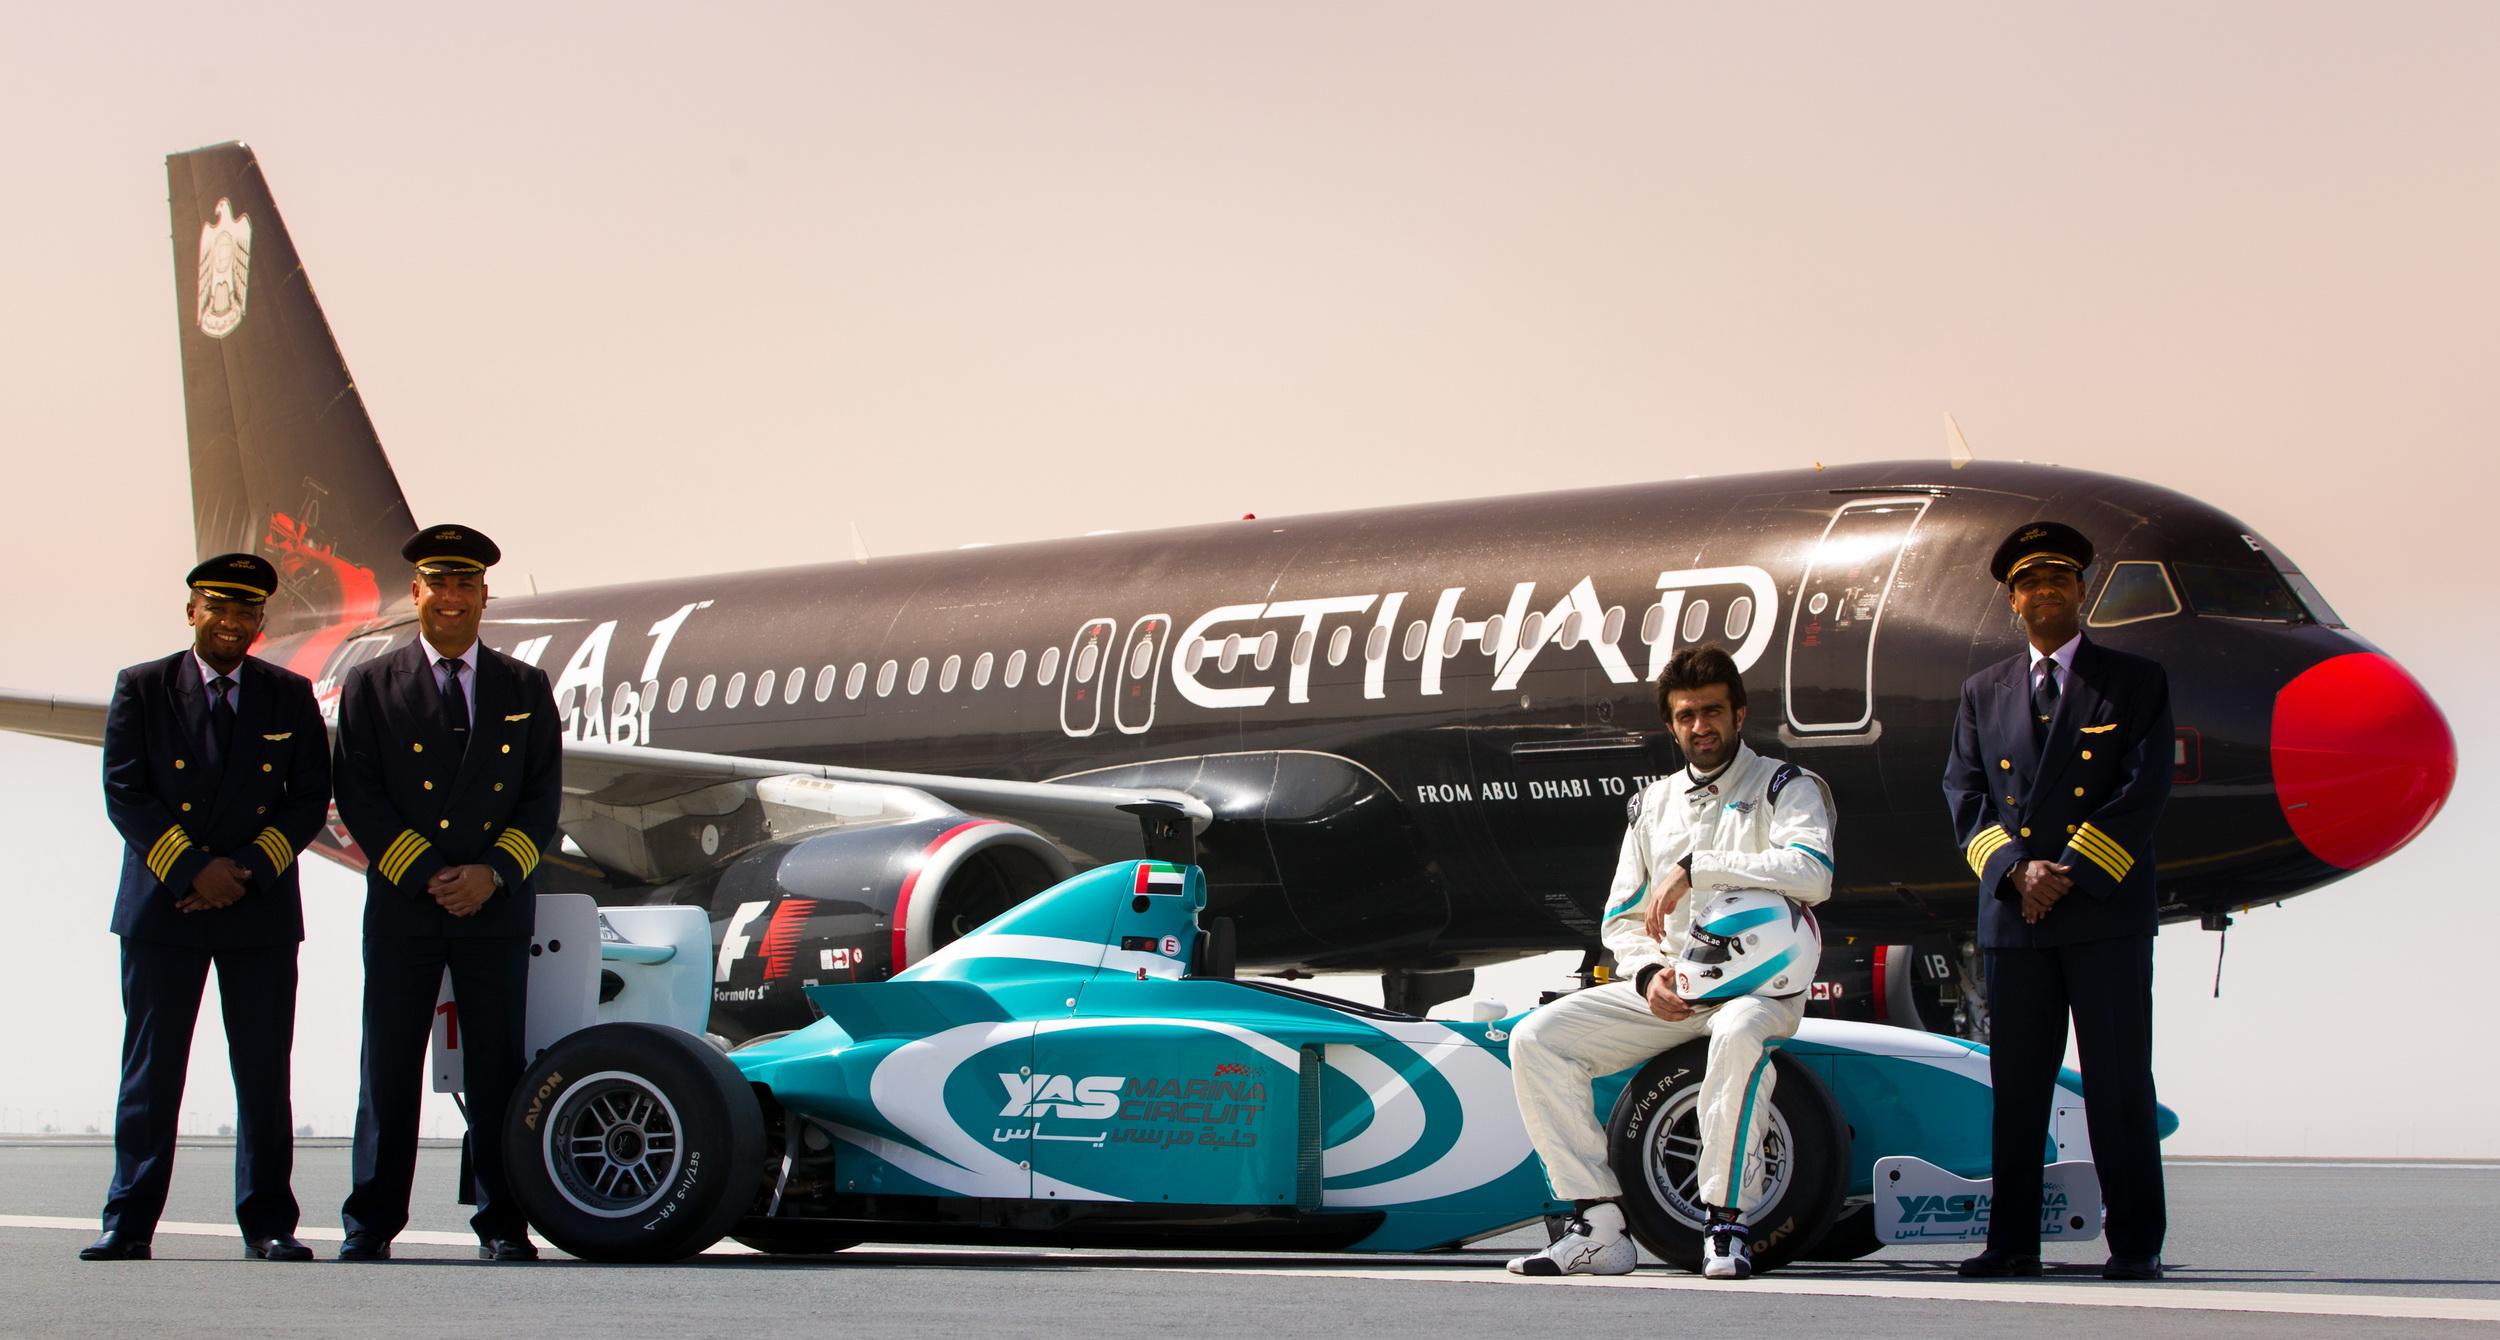 F1: Ticket Sales for Etihad Airways Abu Dhabi Grand Prix take off